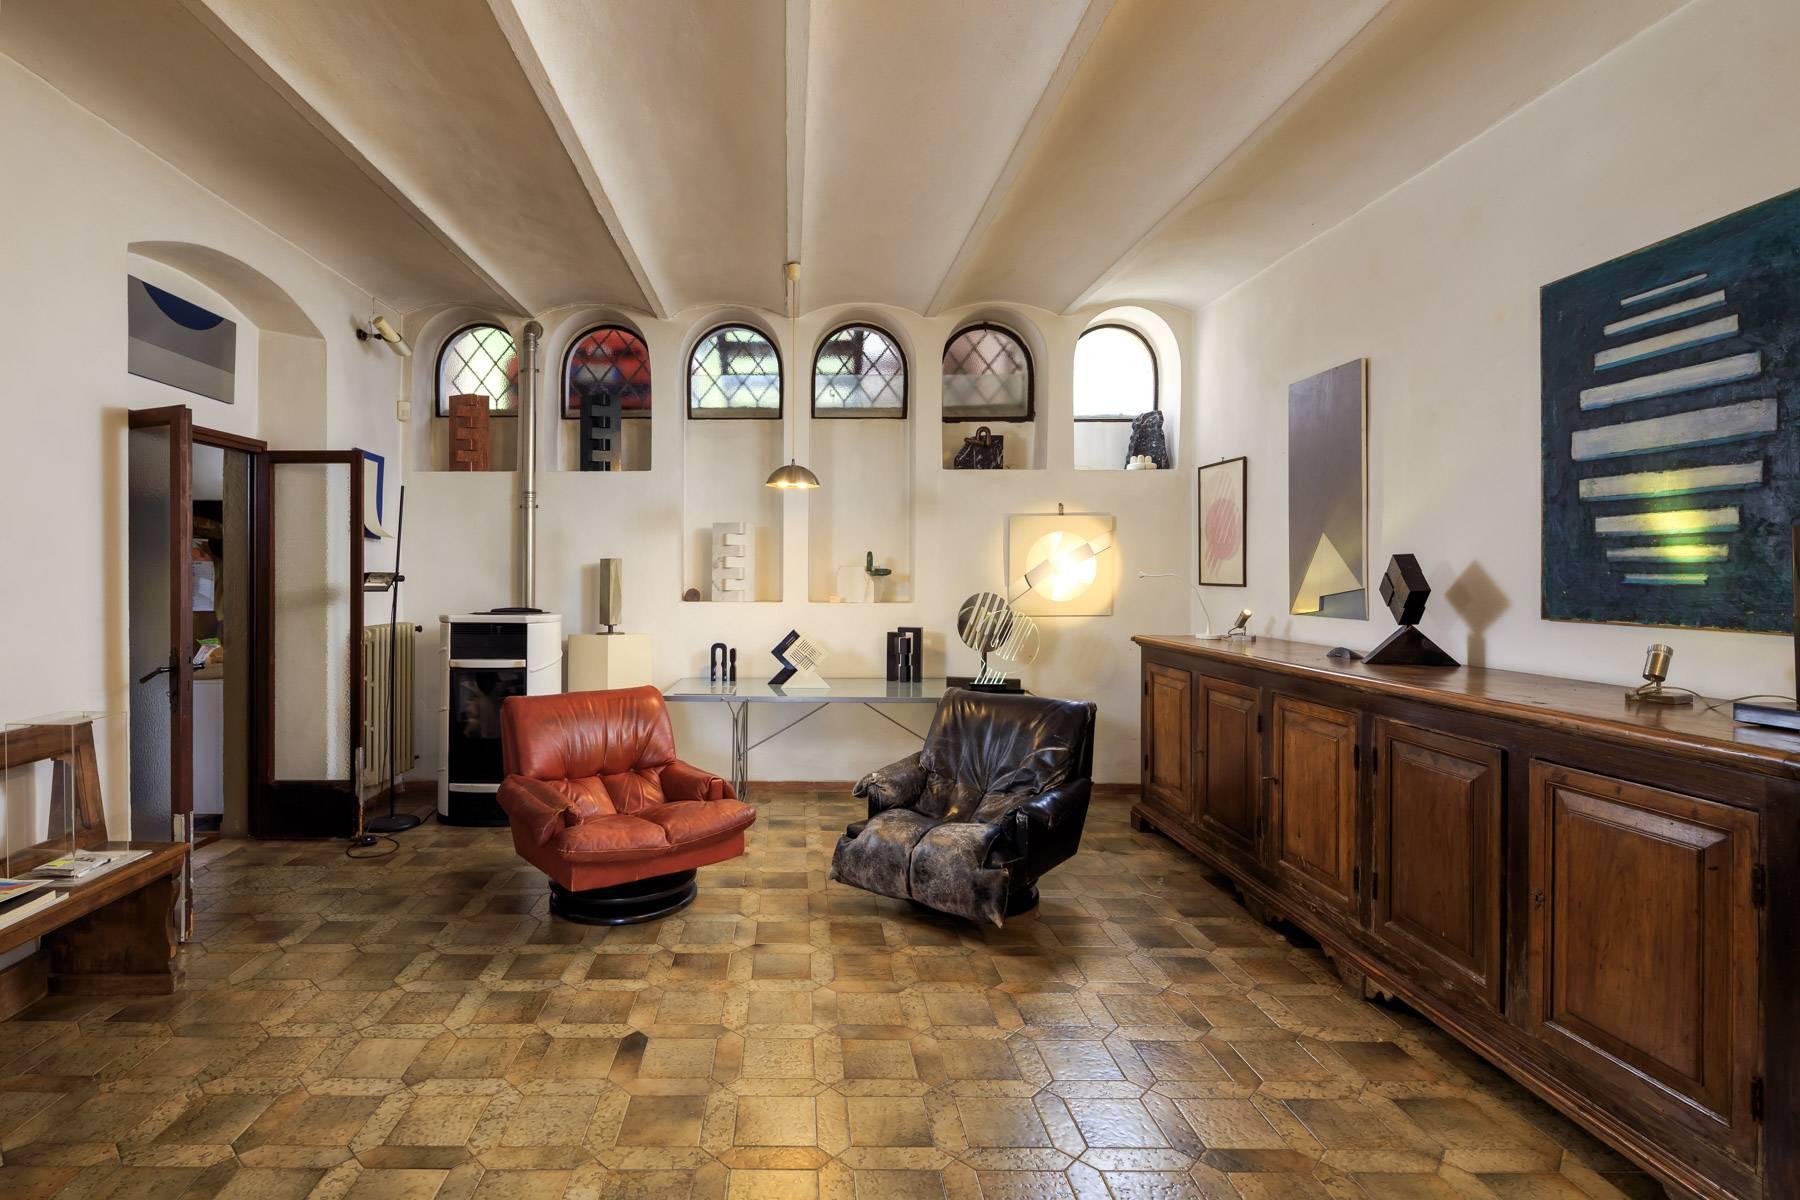 Diana Baylons Haus-Museum - 12